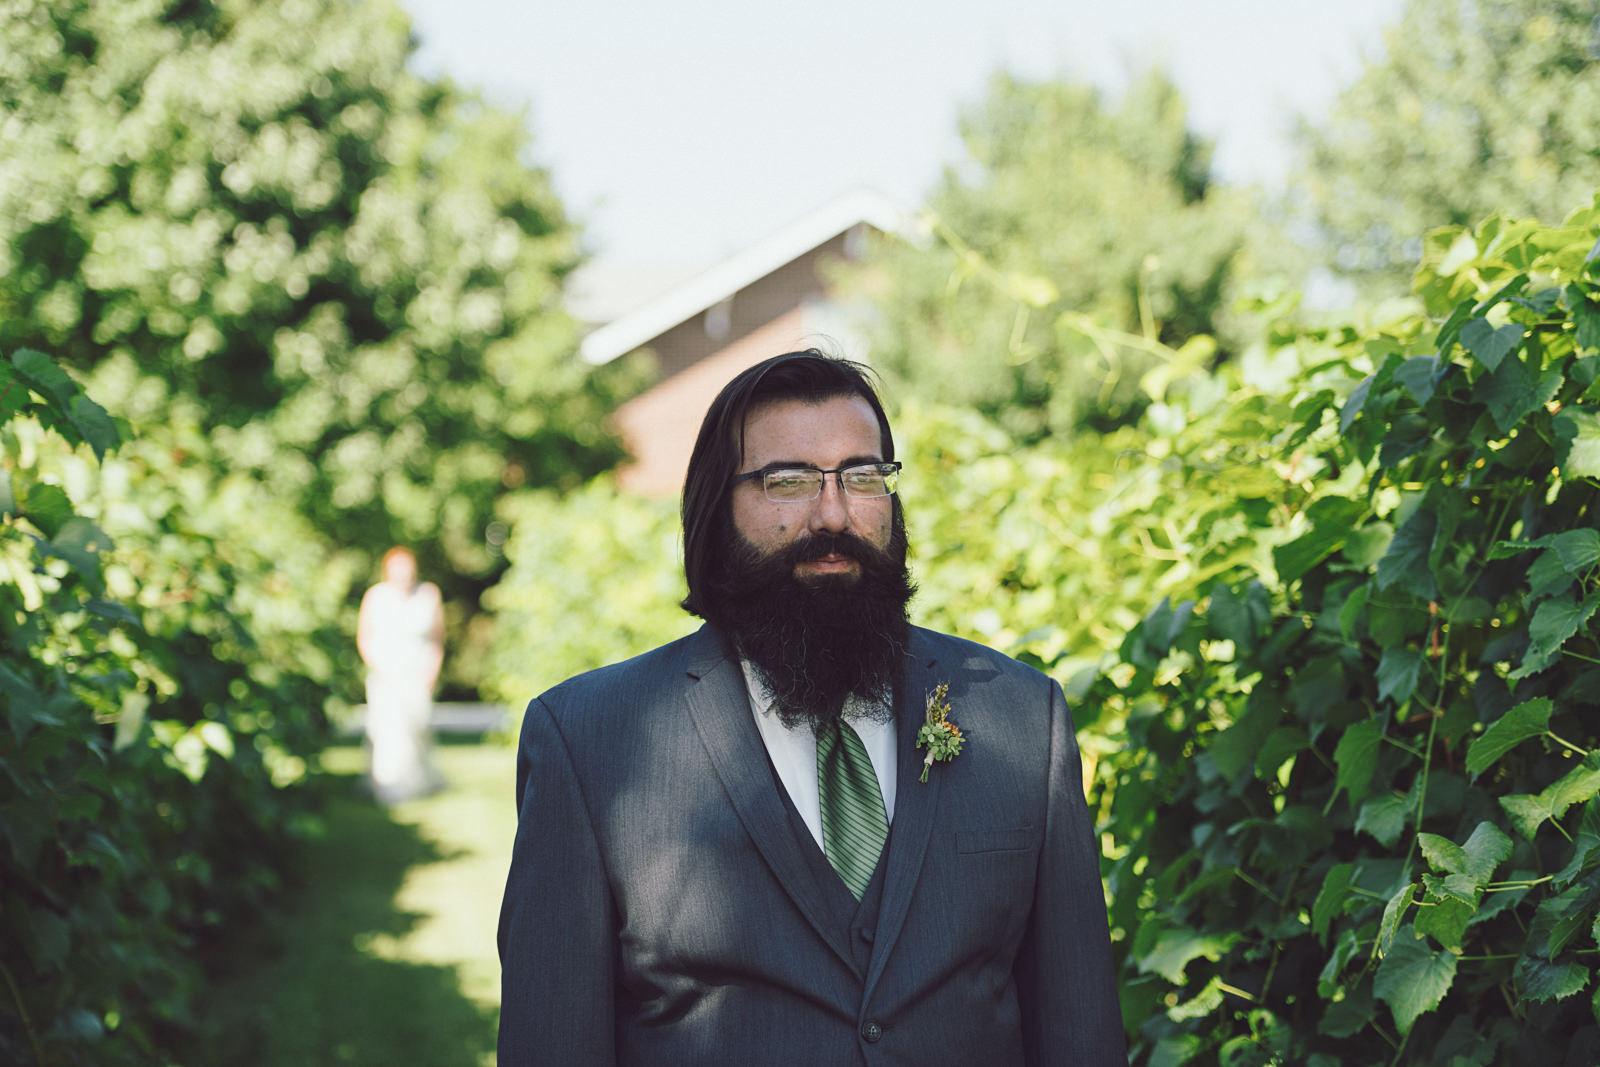 wedding-keely-caleb-130-name-your-photo.jpg